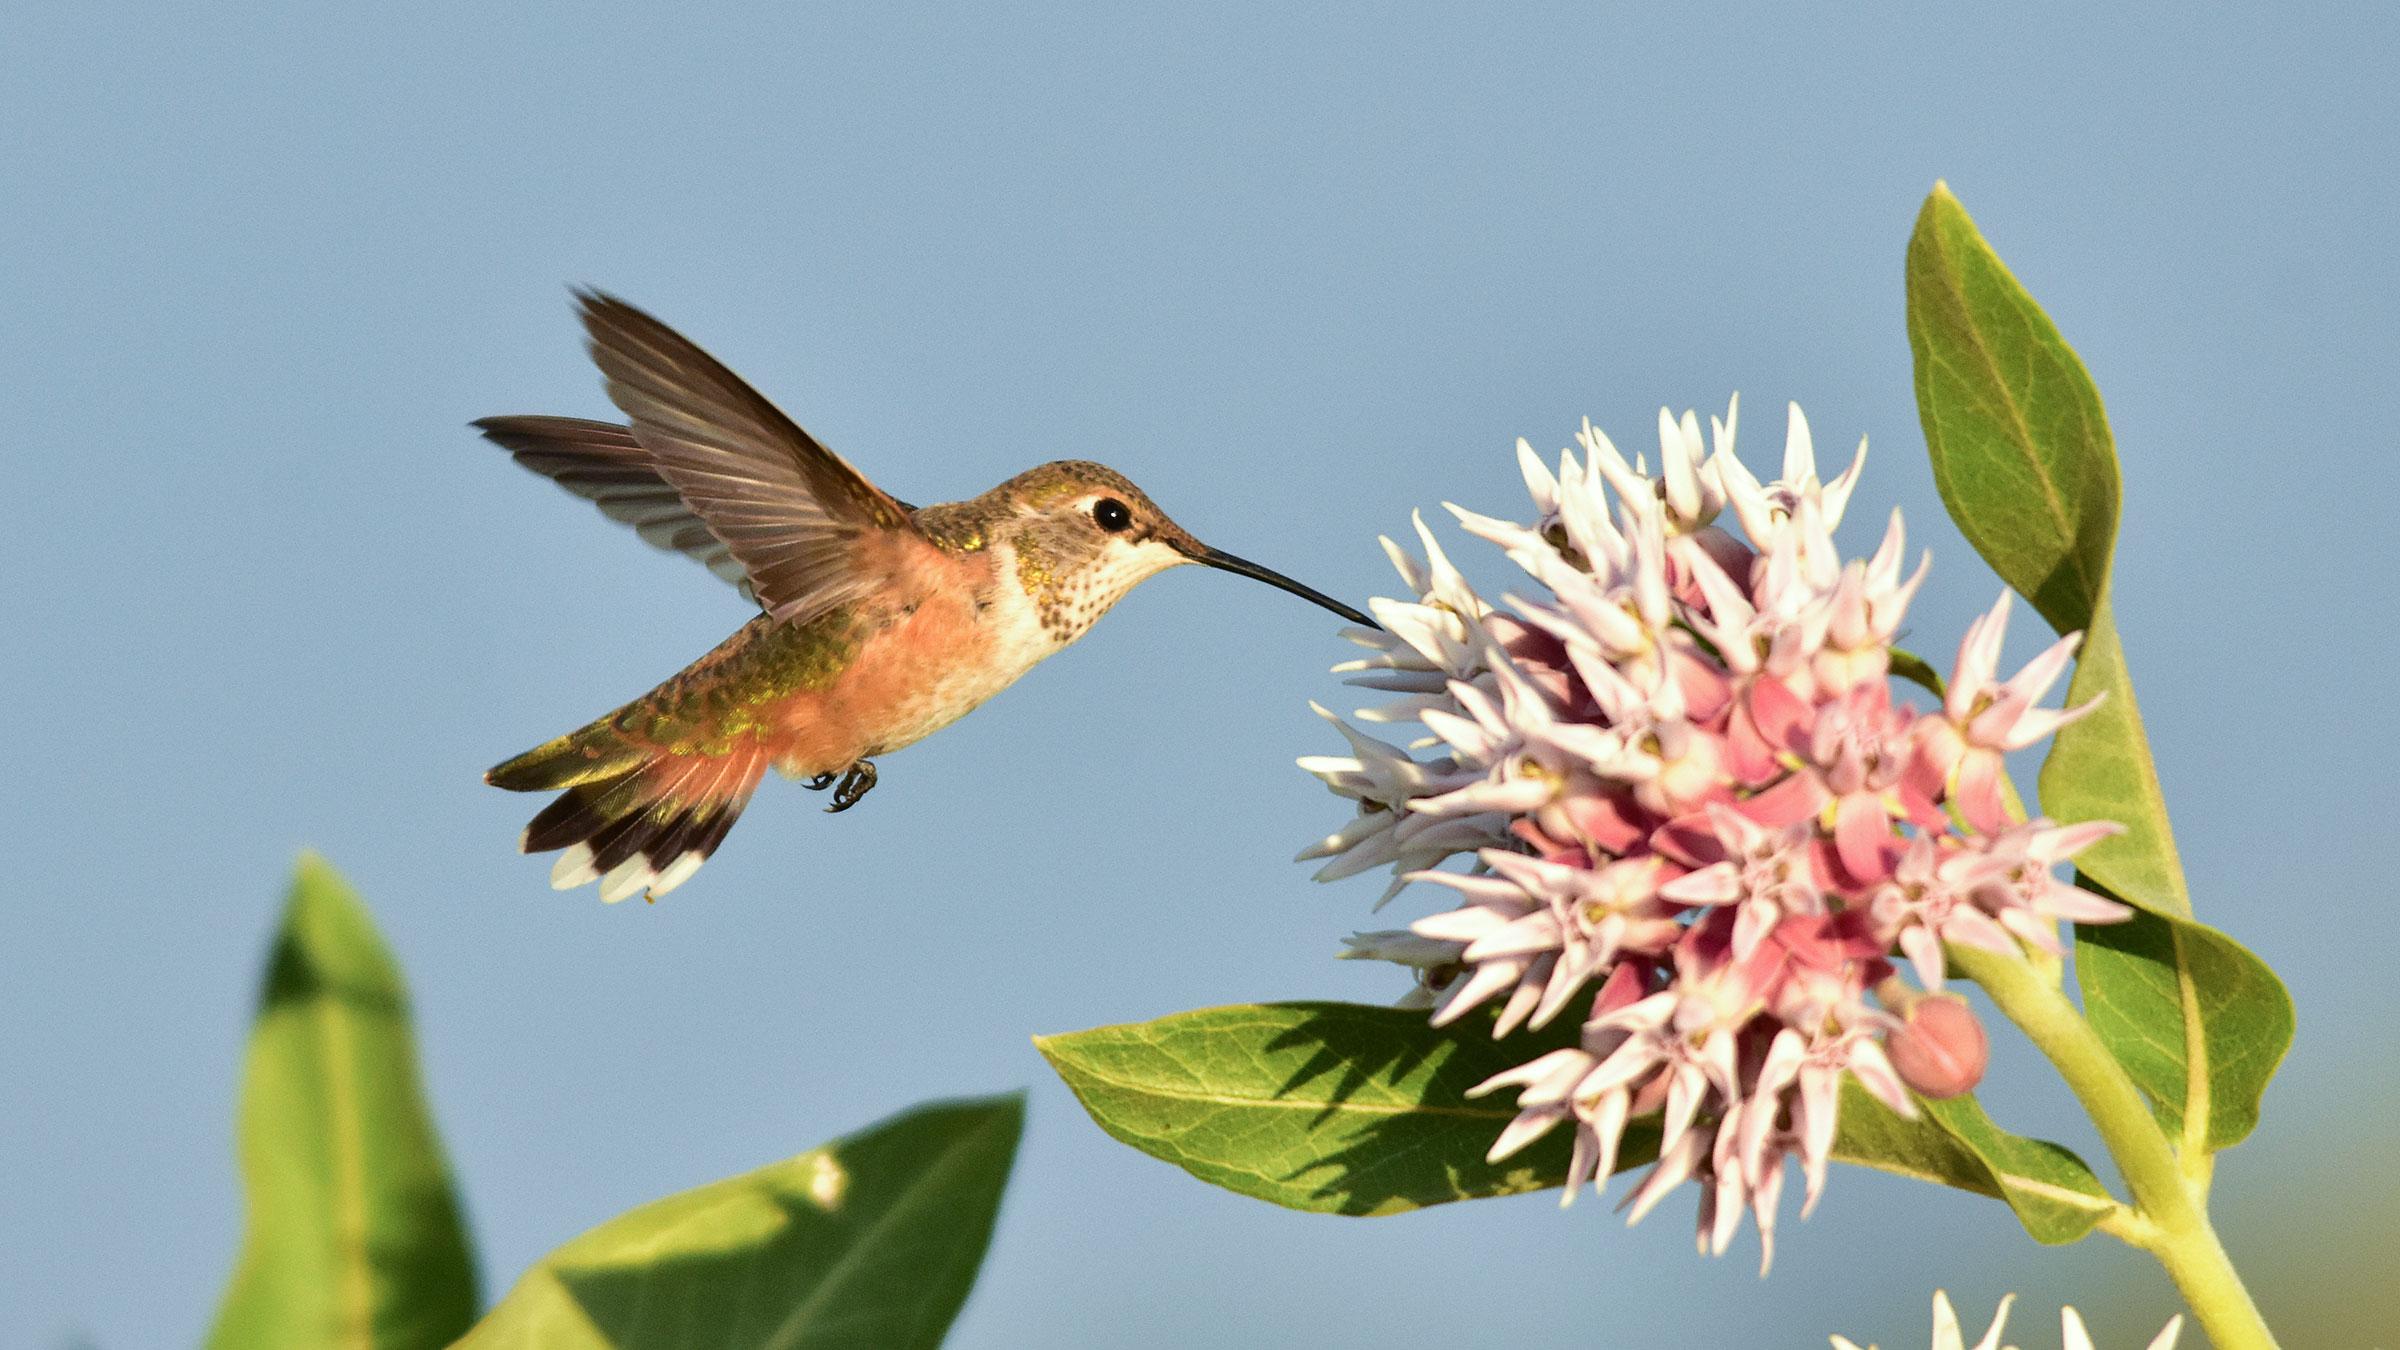 rufous-hummingbird-at-showy-milkweed_tom-koerner_usfws.jpg